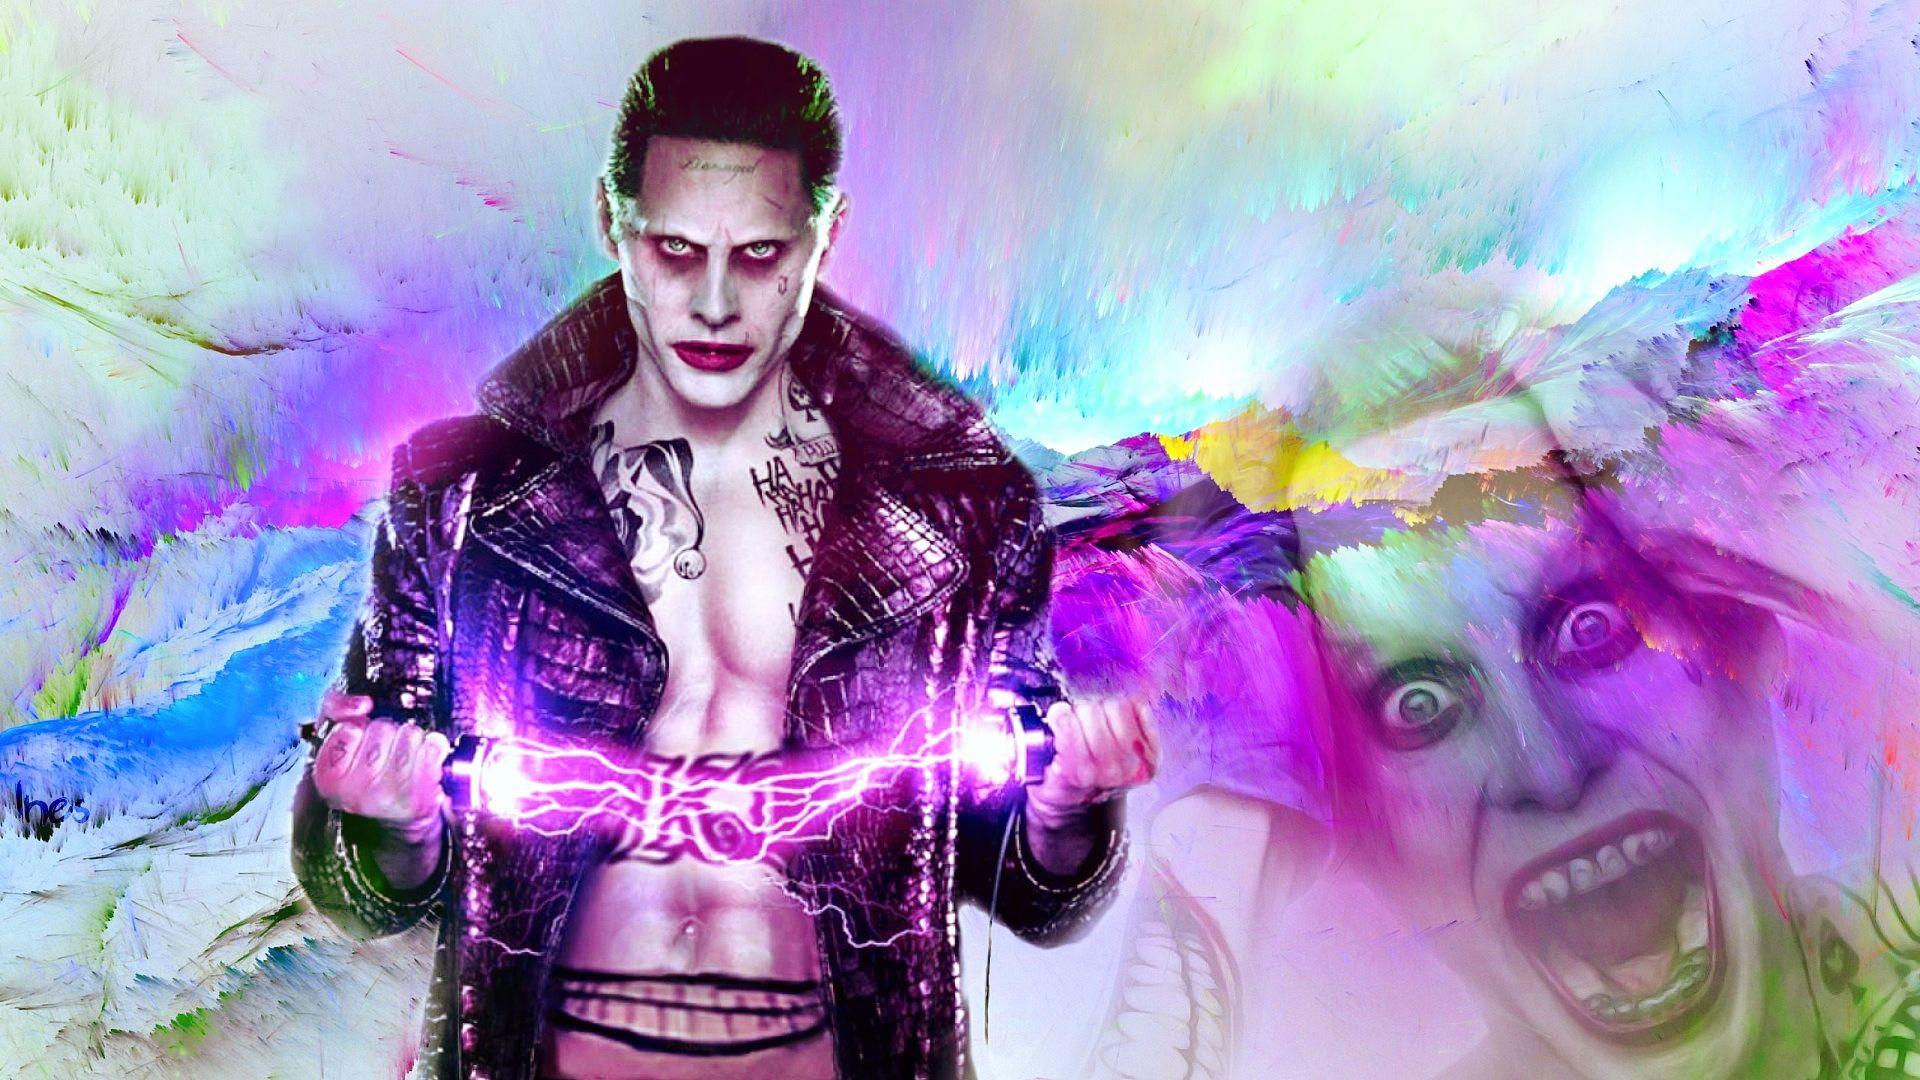 Suicide Squad, Joker, Good Wallpaper